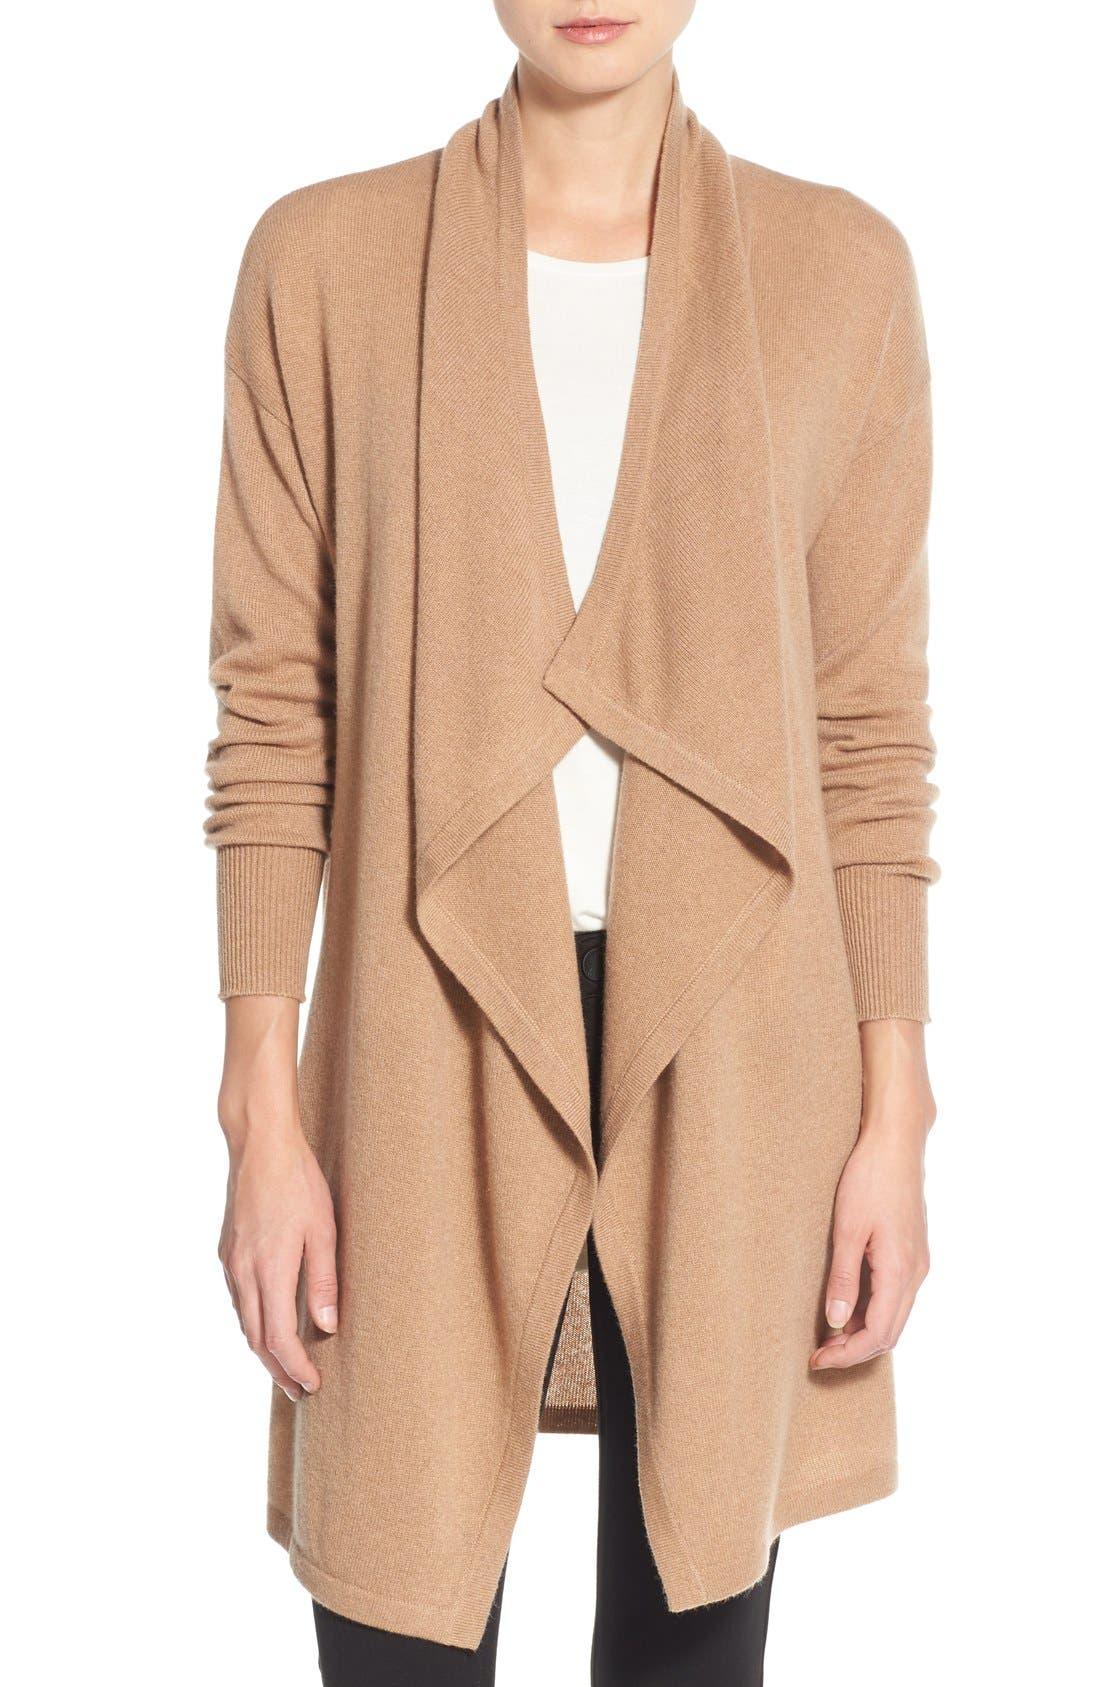 Alternate Image 1 Selected - Halogen® Cashmere Long Drape Front Cardigan (Regular & Petite)